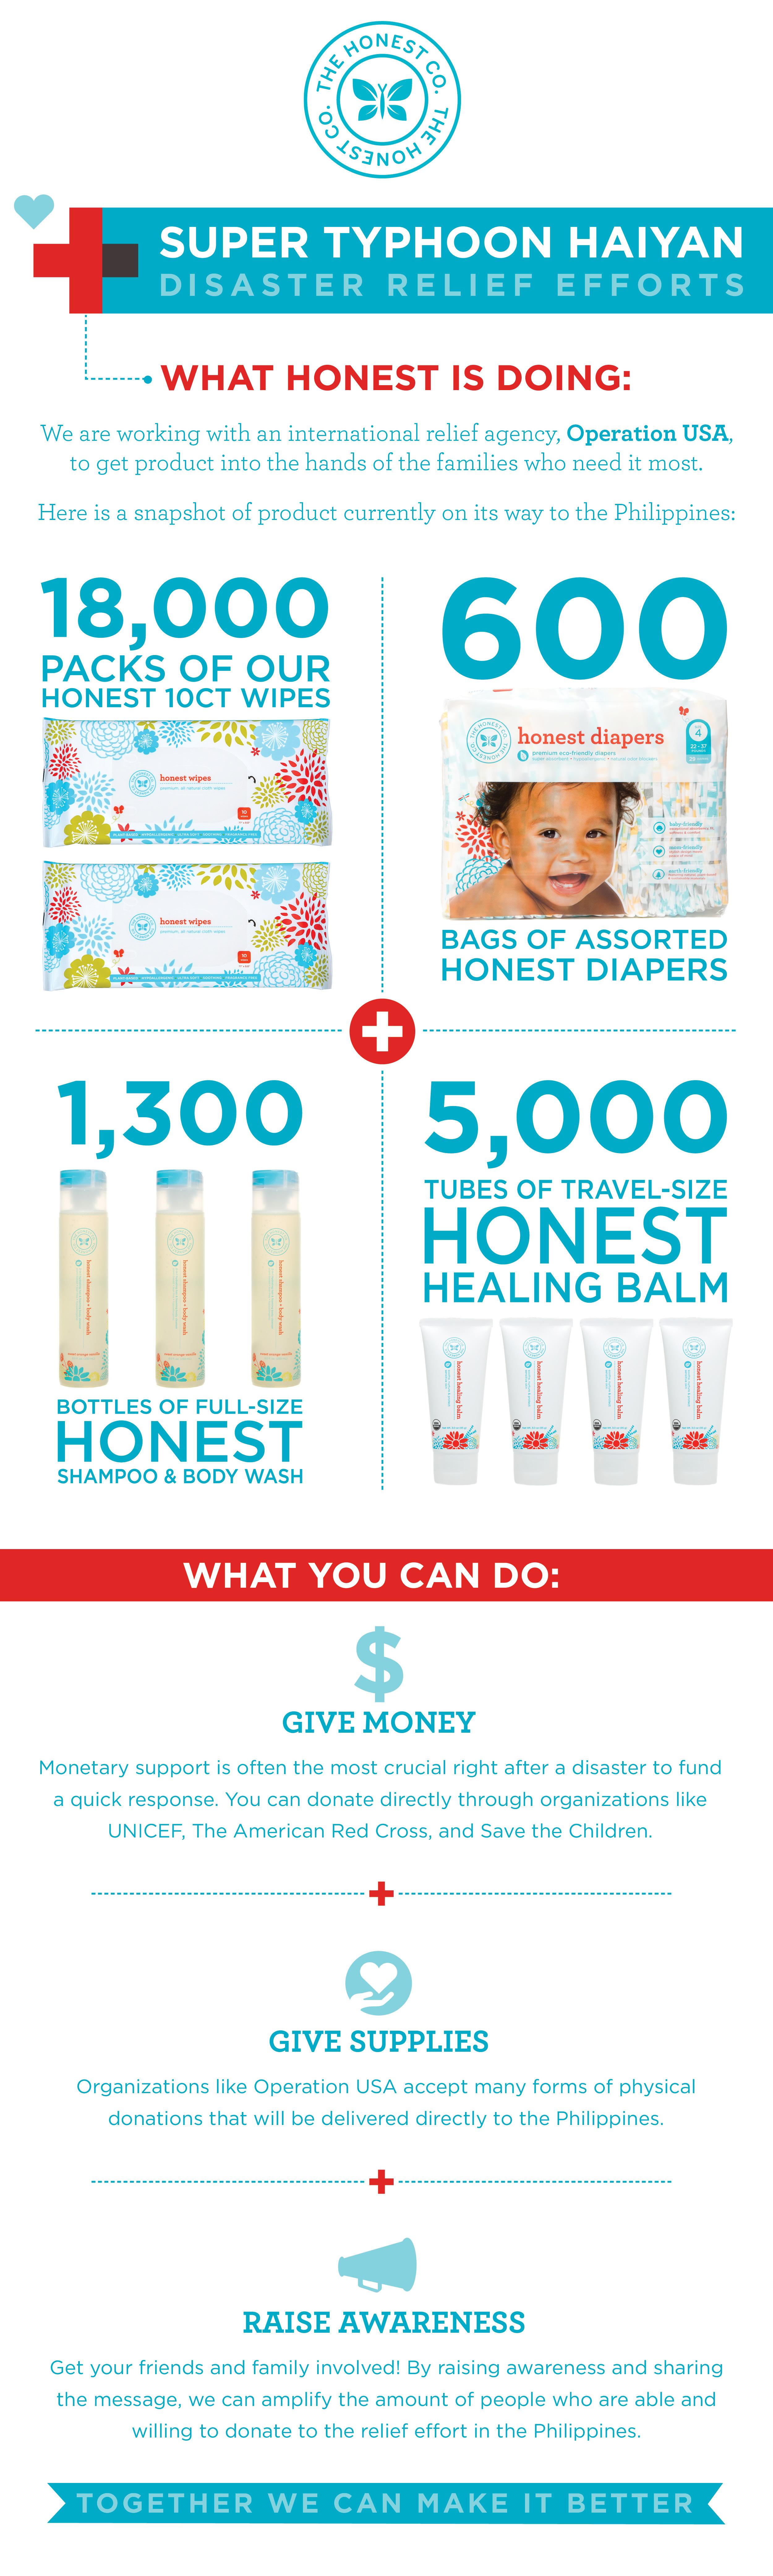 Join Honest in Super Typhoon Haiyan Relief Efforts